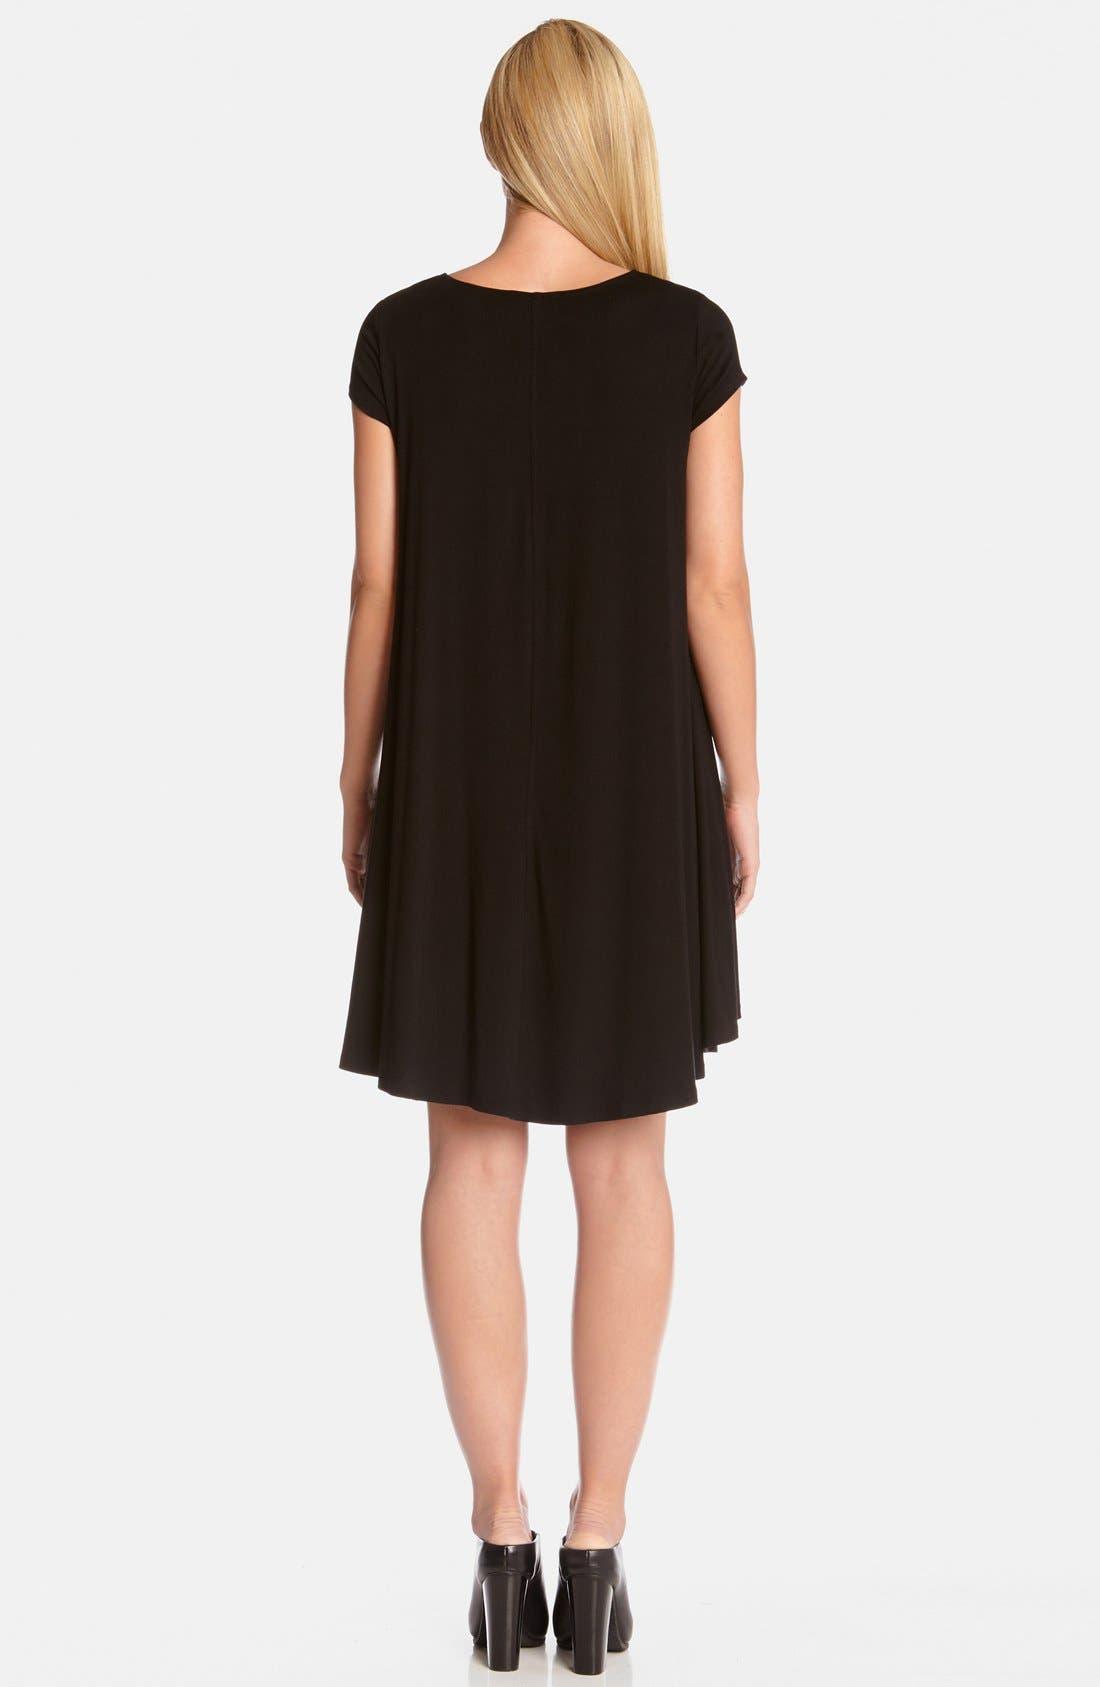 KAREN KANE, 'Maggie' Cap Sleeve Trapeze Dress, Alternate thumbnail 2, color, BLACK